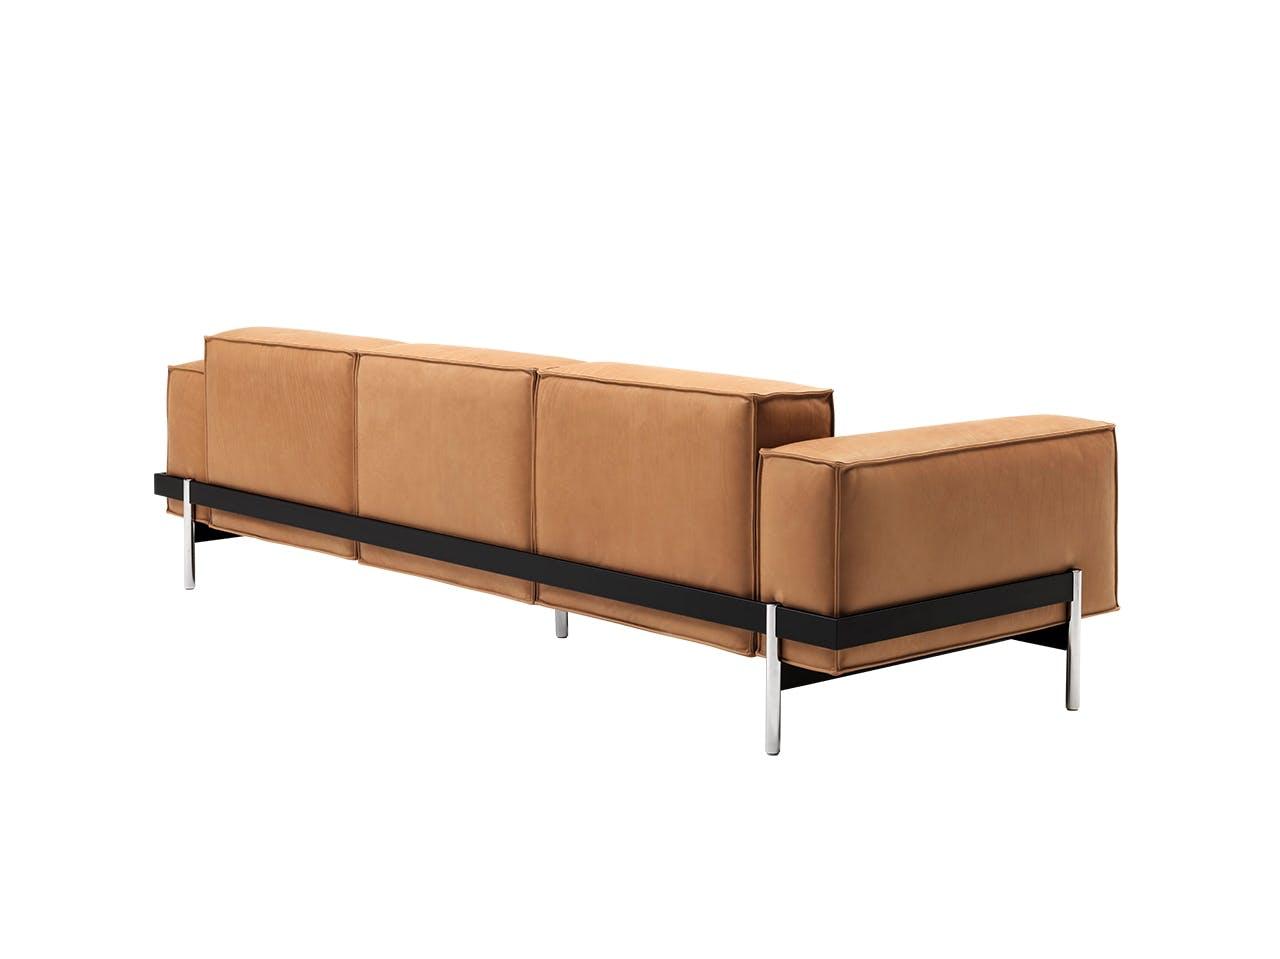 de Sede sofa i karamelfarve med metalrammer